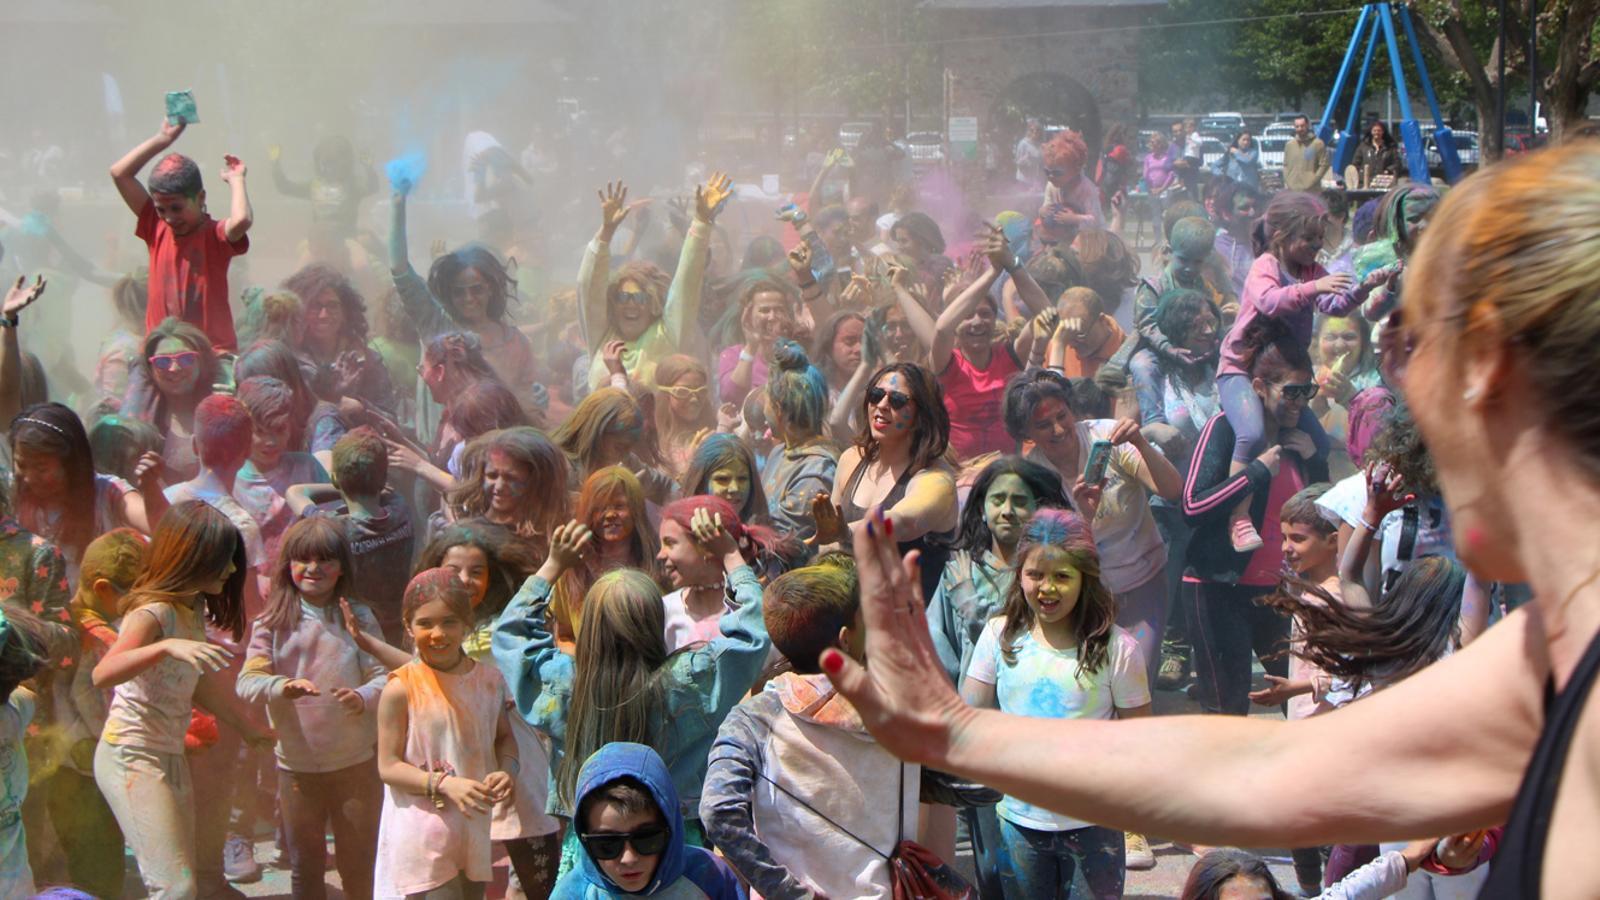 Un moment de la 'Holy Party' celebrada aquest diumenge a Encamp. / M. P. (ANA)